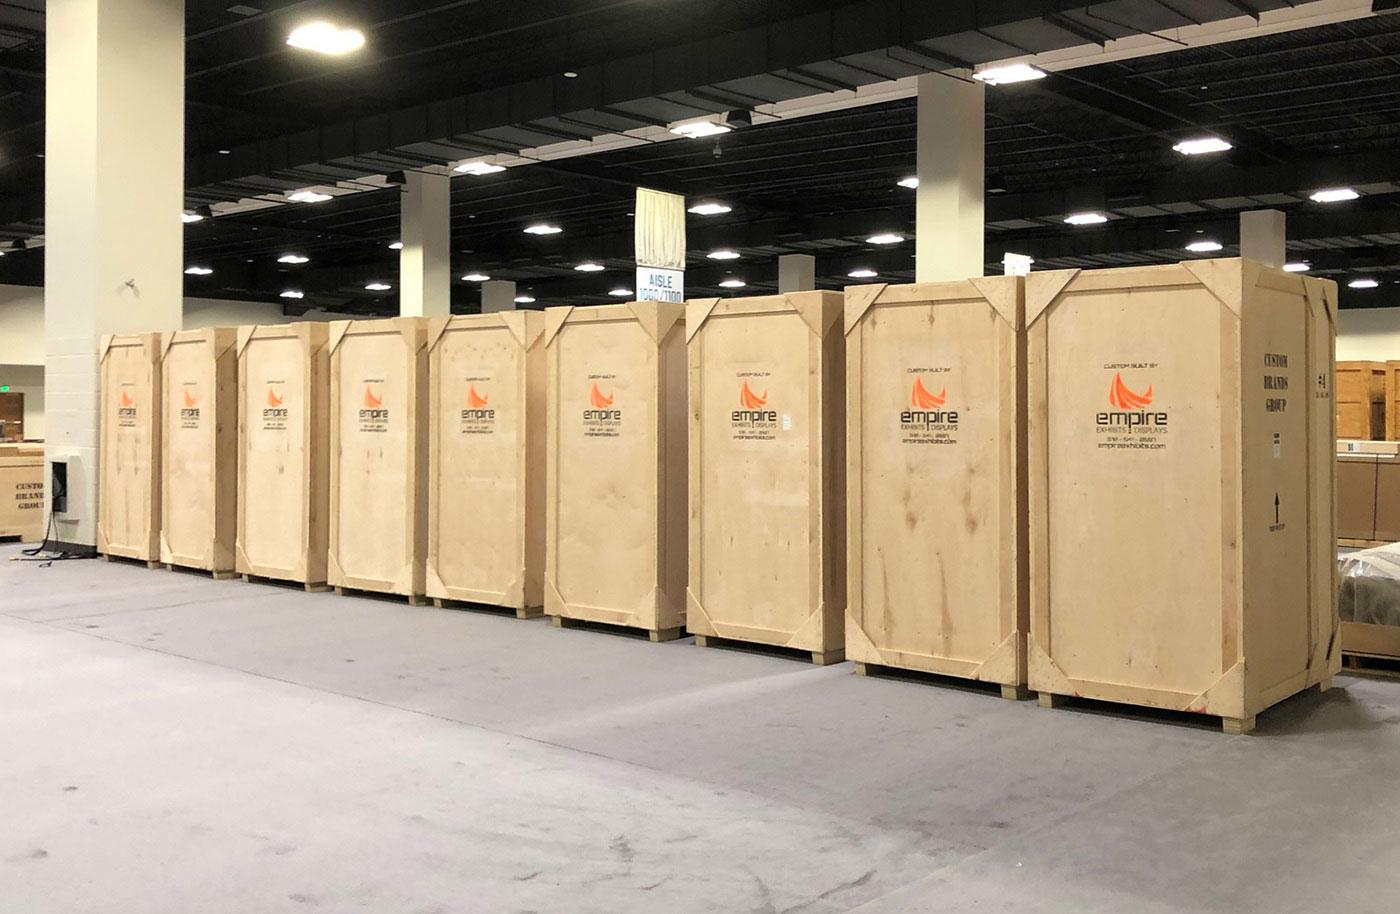 empire trade show crates in a line